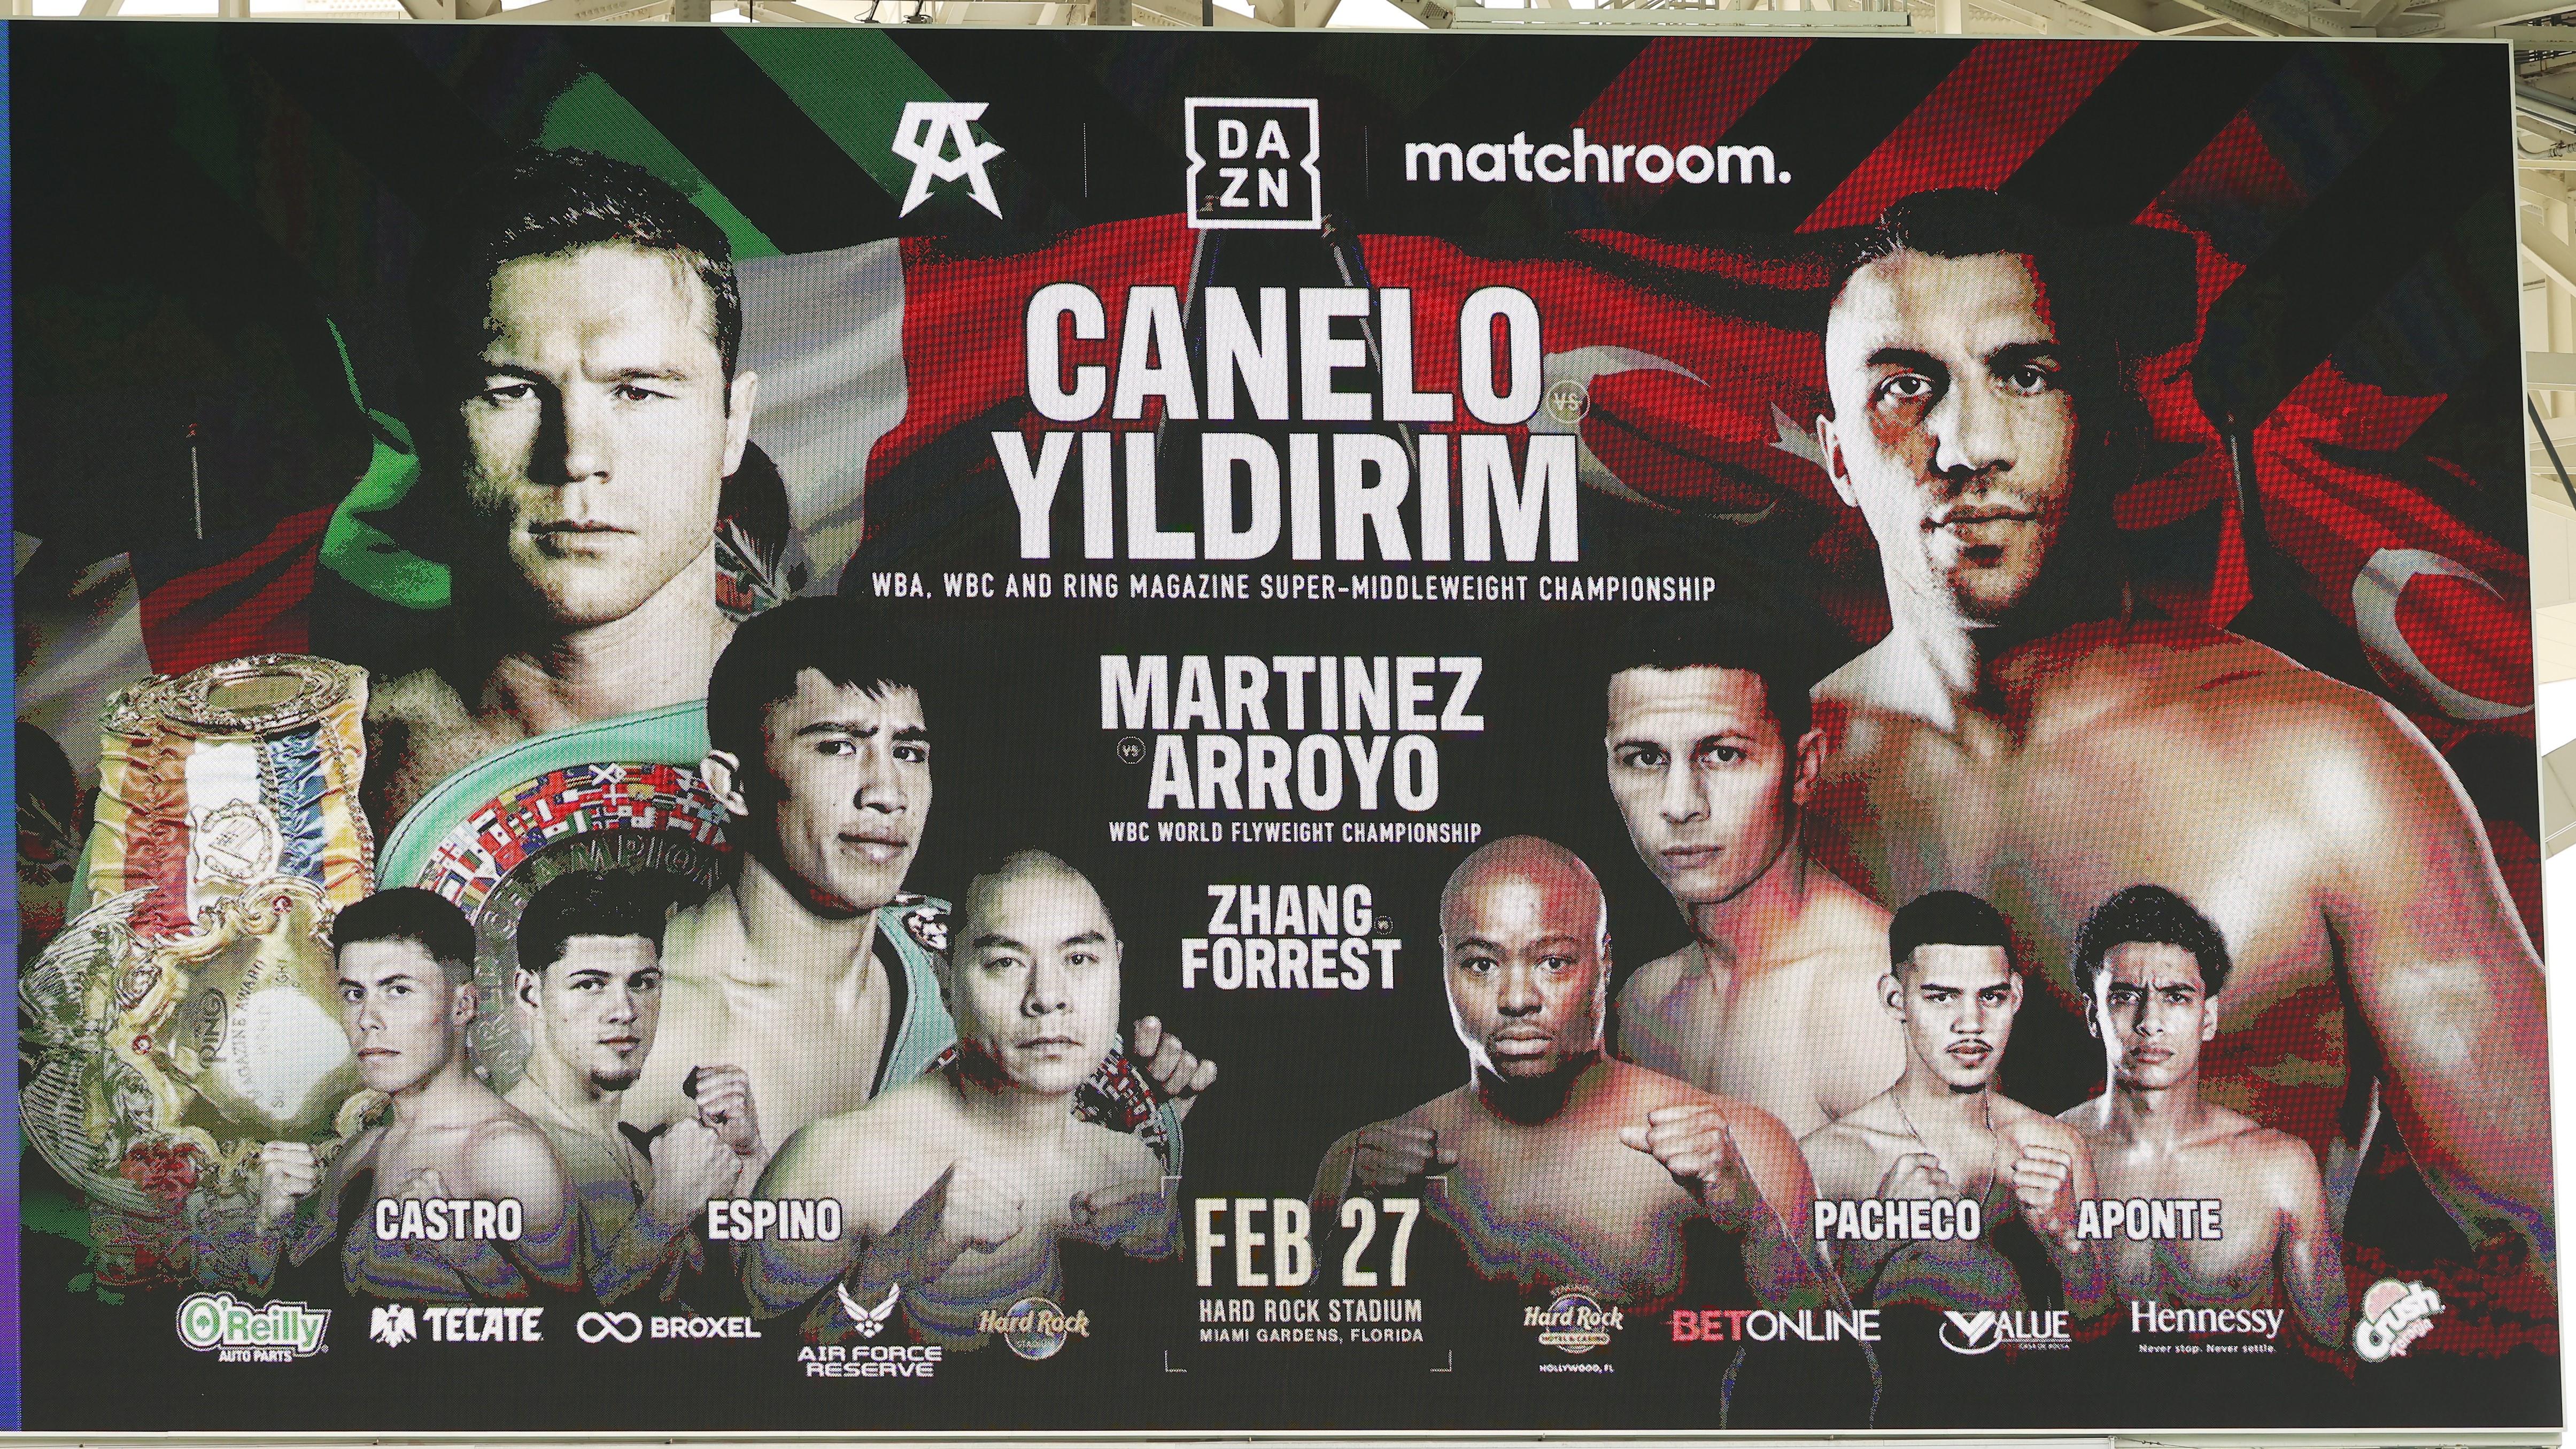 Canelo Alvarez vs Anvi Yildirim live stream: how to watch online from anywhere now thumbnail